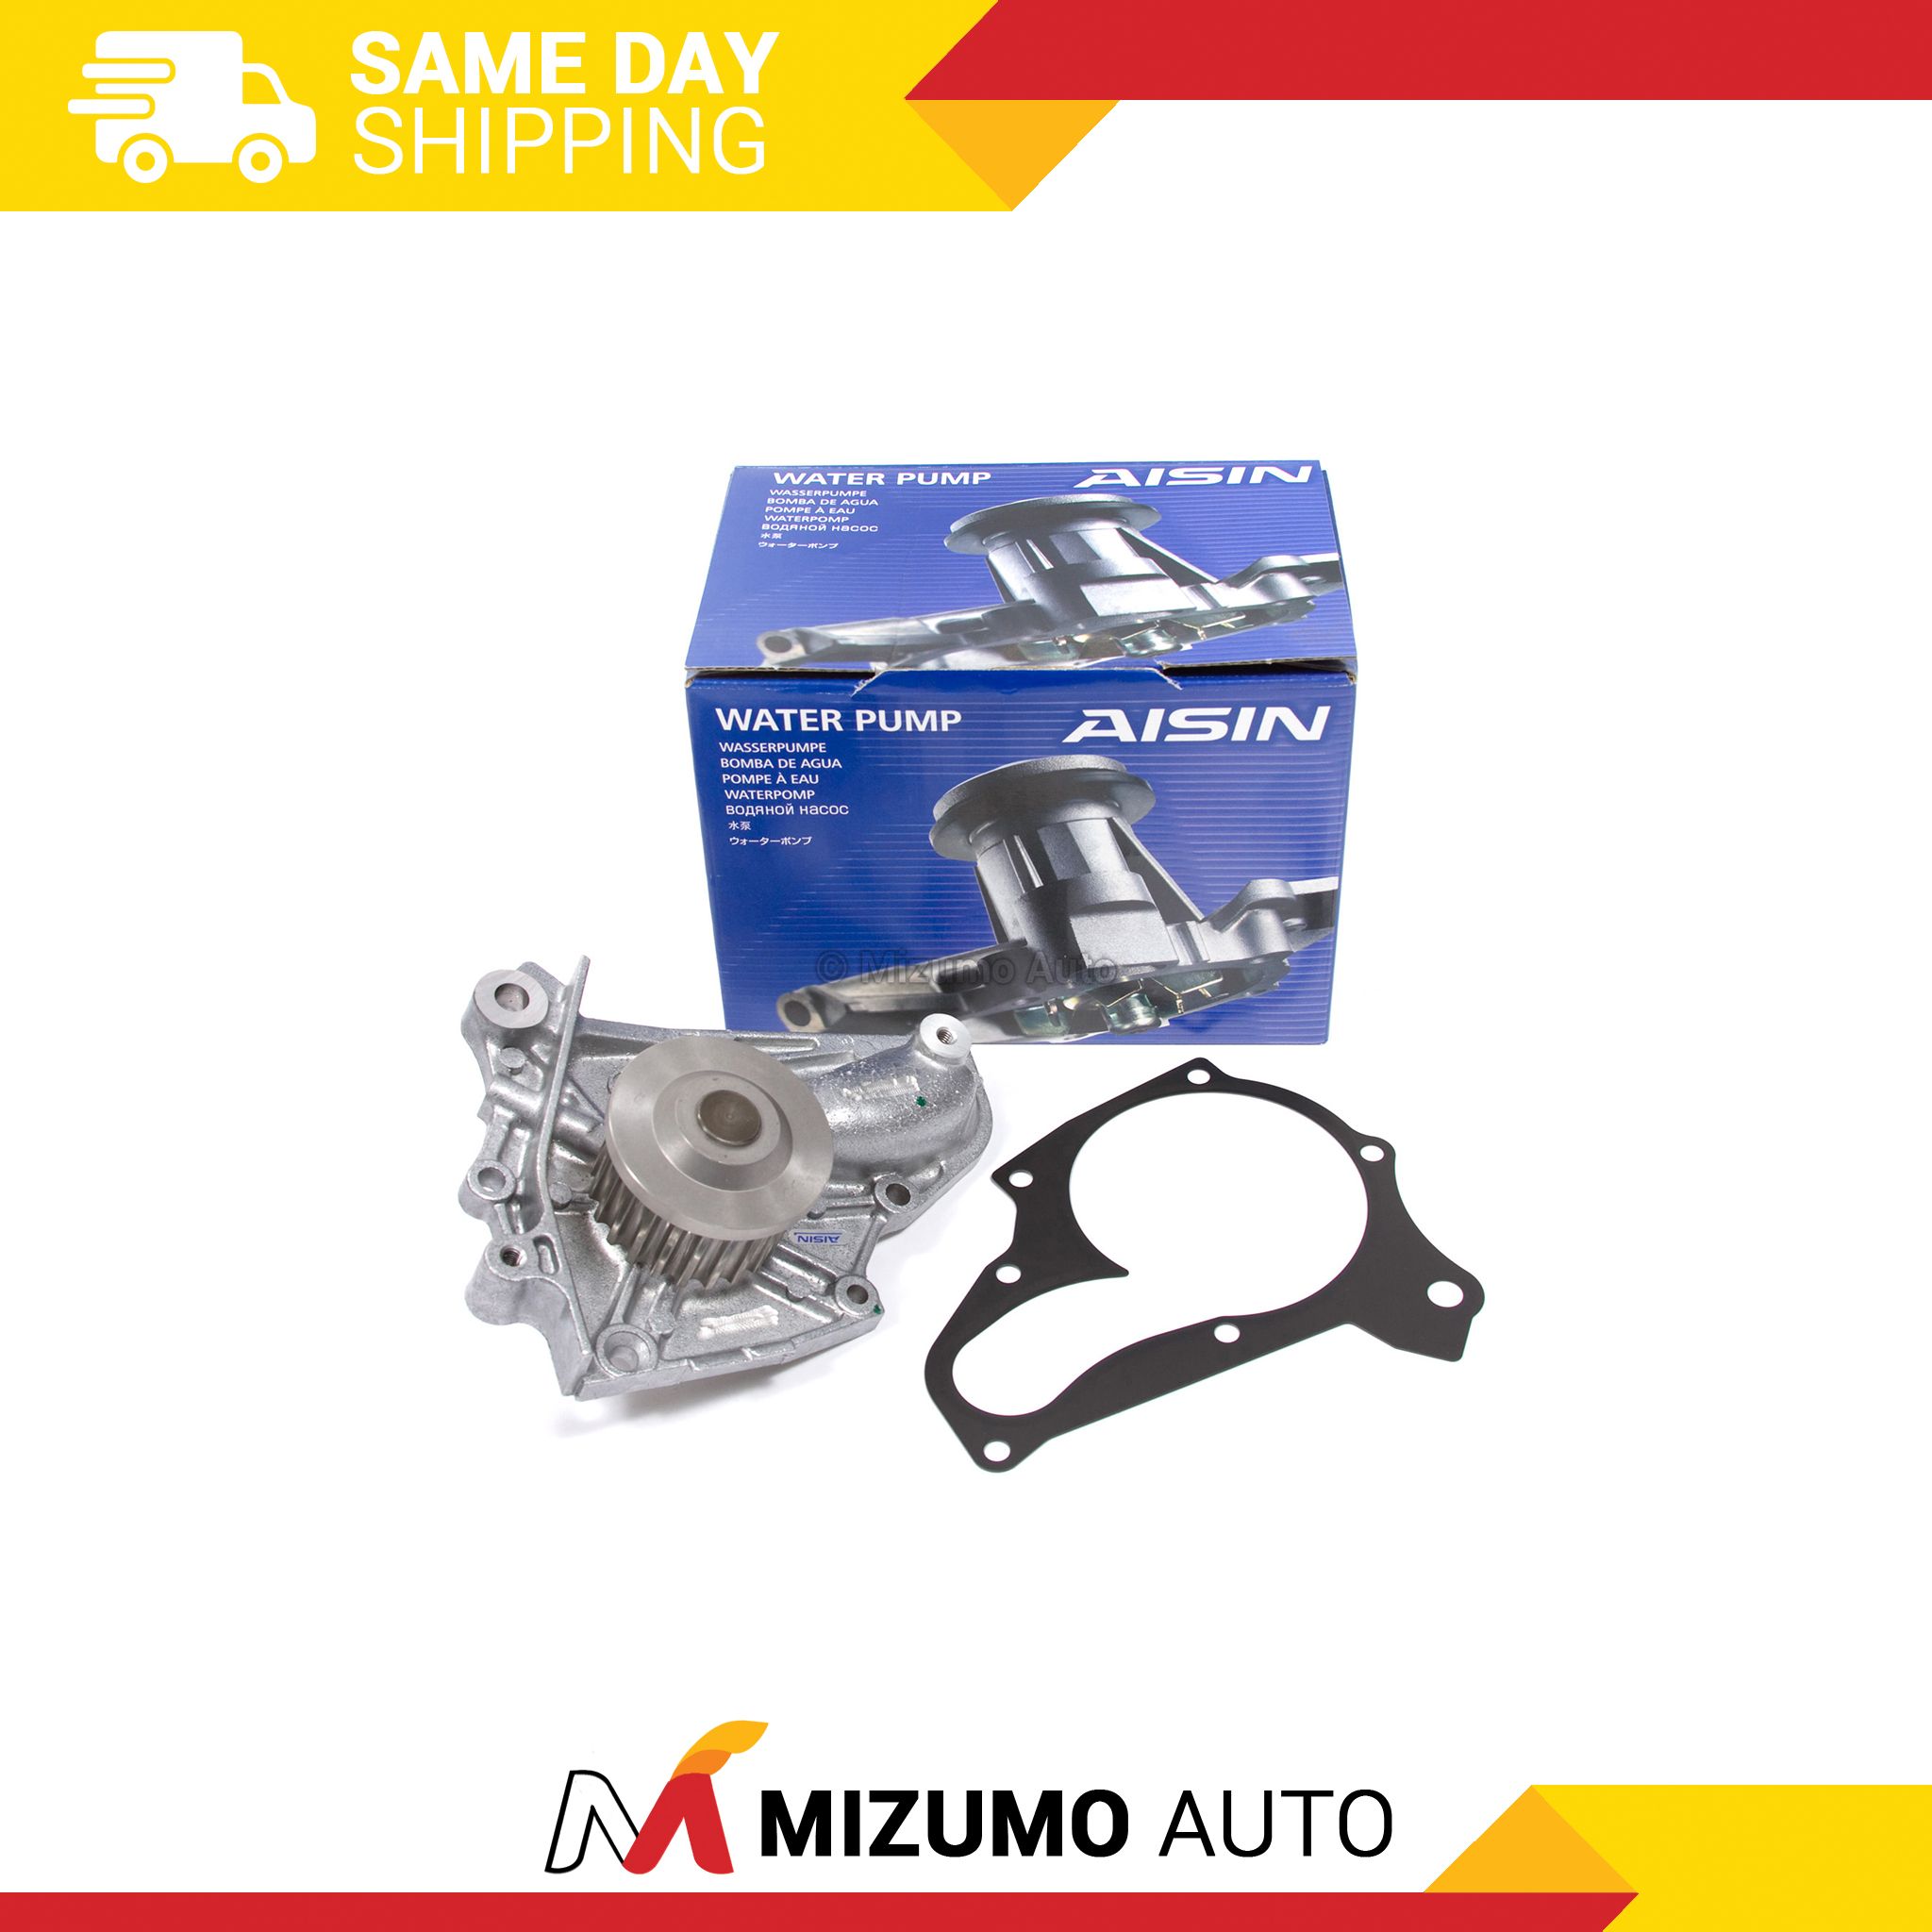 Timing Belt Kit COMPLETE WATER PUMP TENSIONER Toyota MR2 Turbo 92 93 94 95 3SGTE